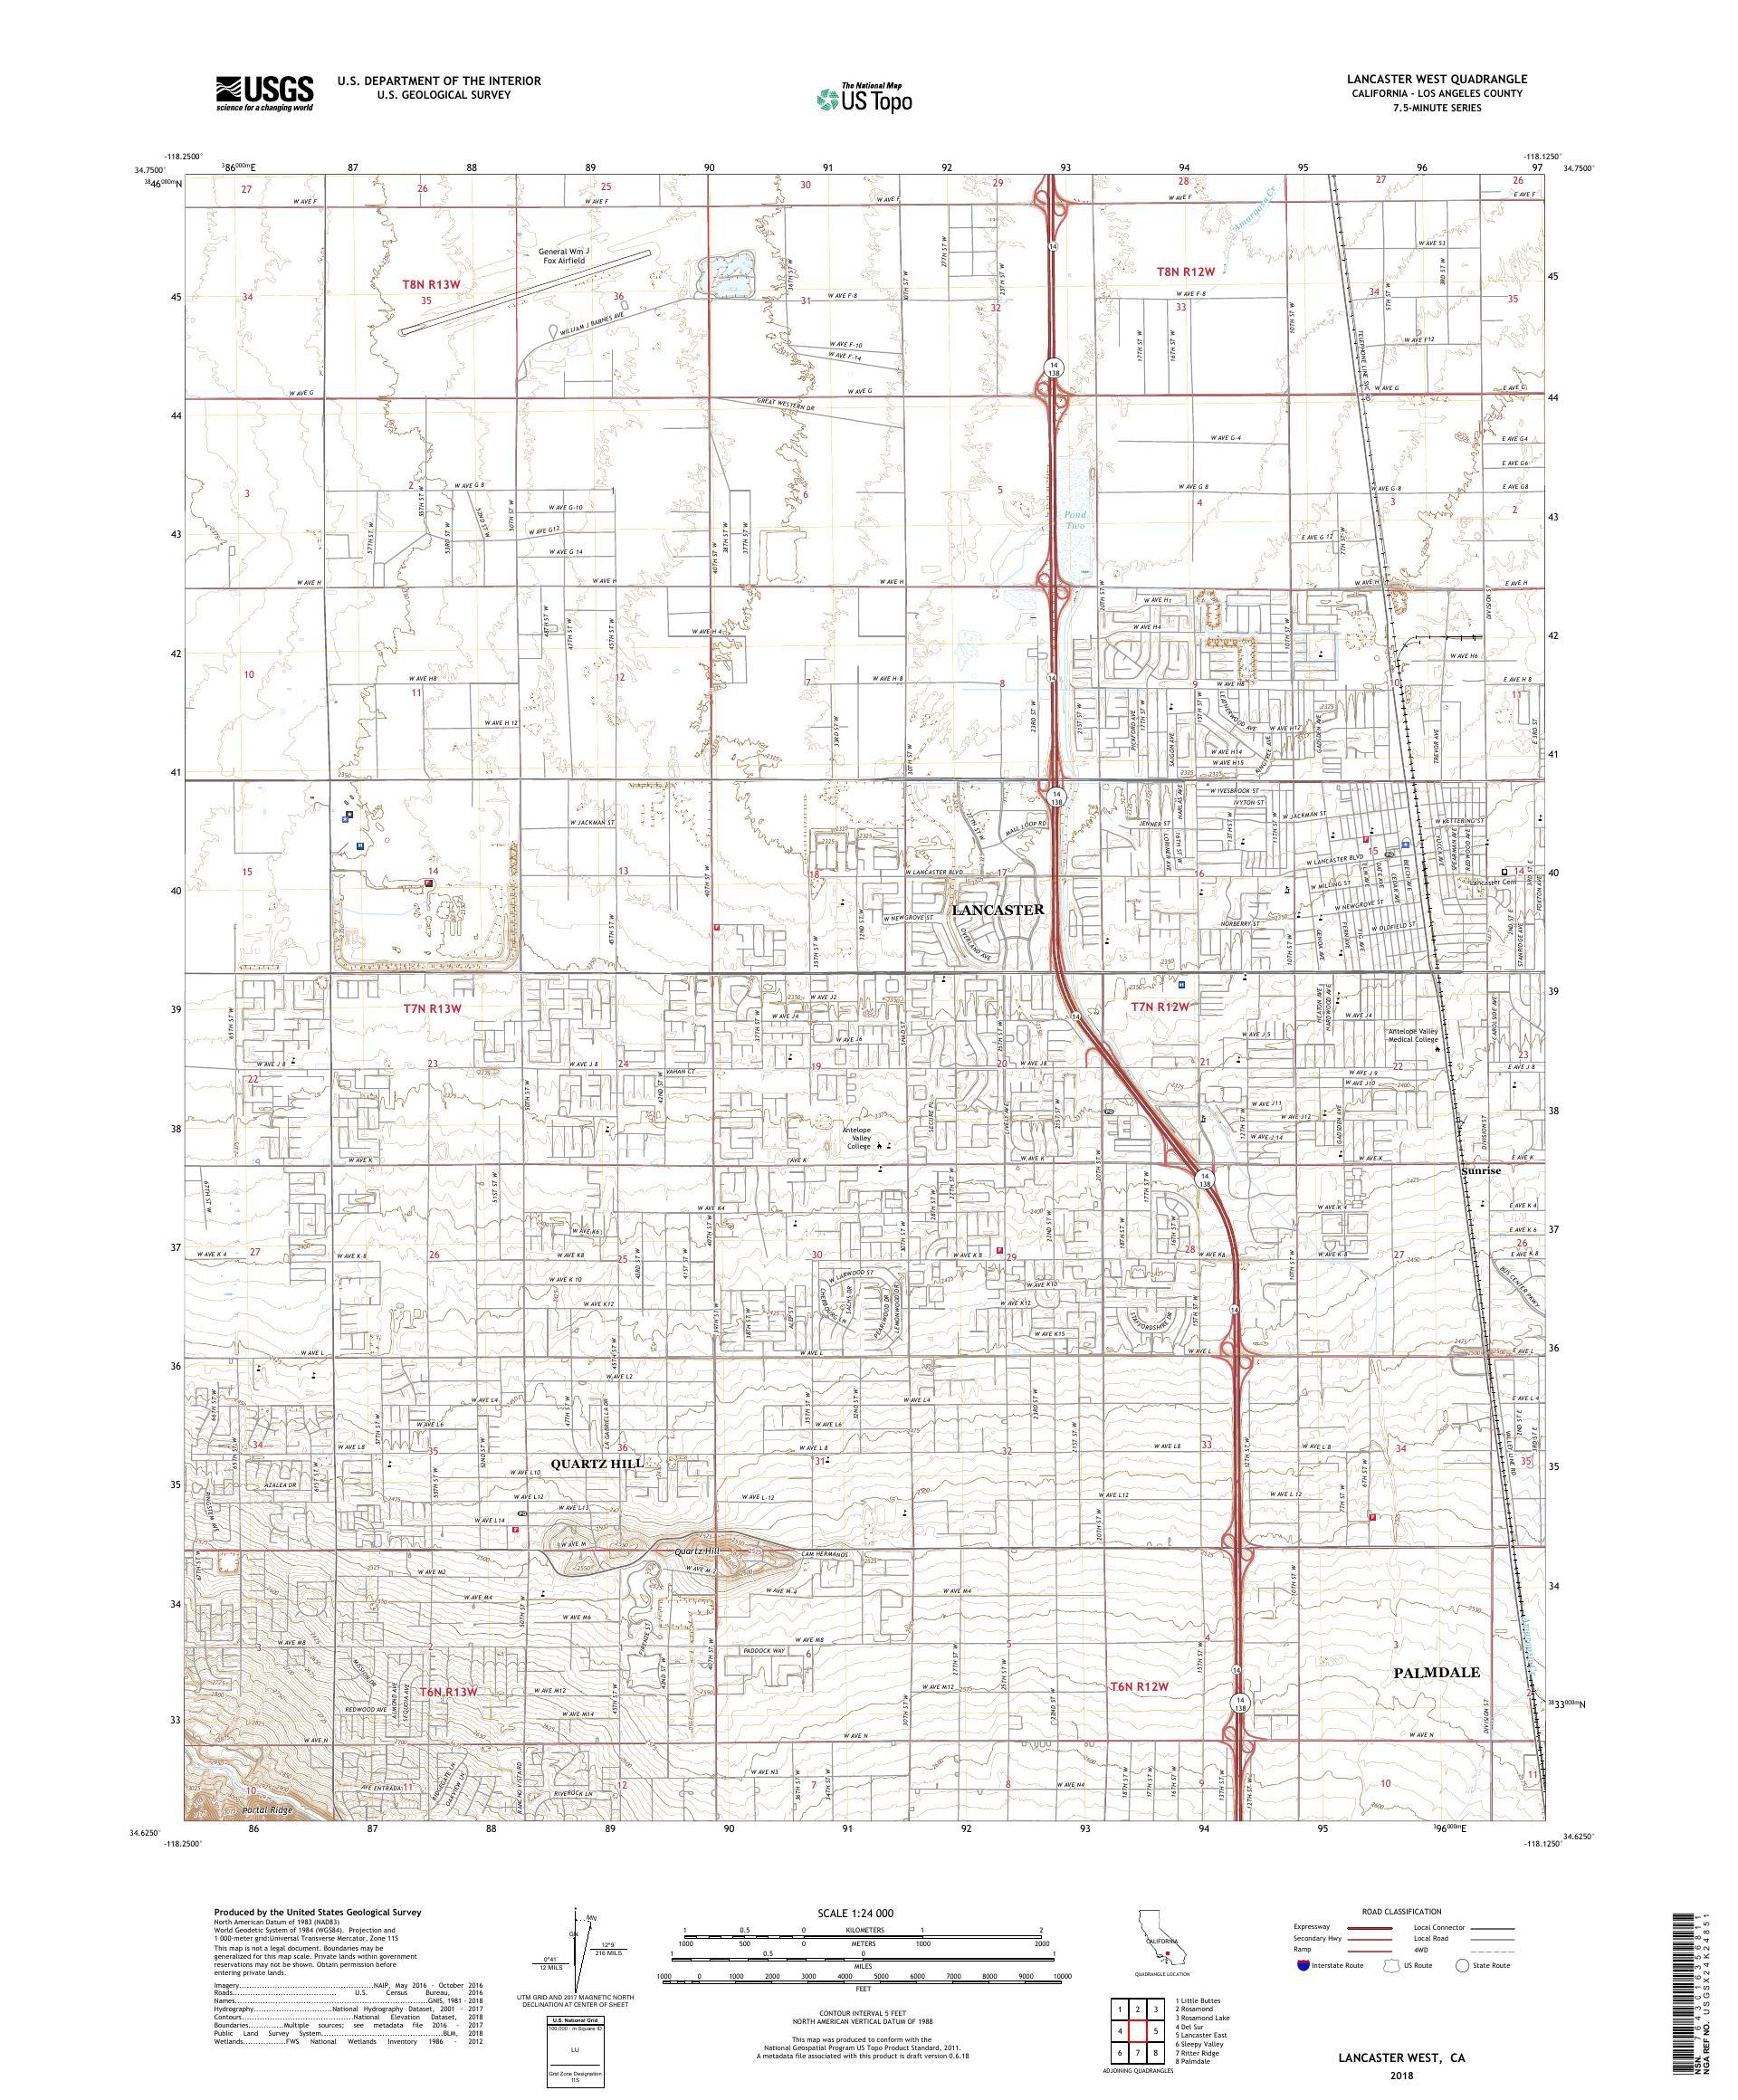 MyTopo Lancaster West, California USGS Quad Topo Map